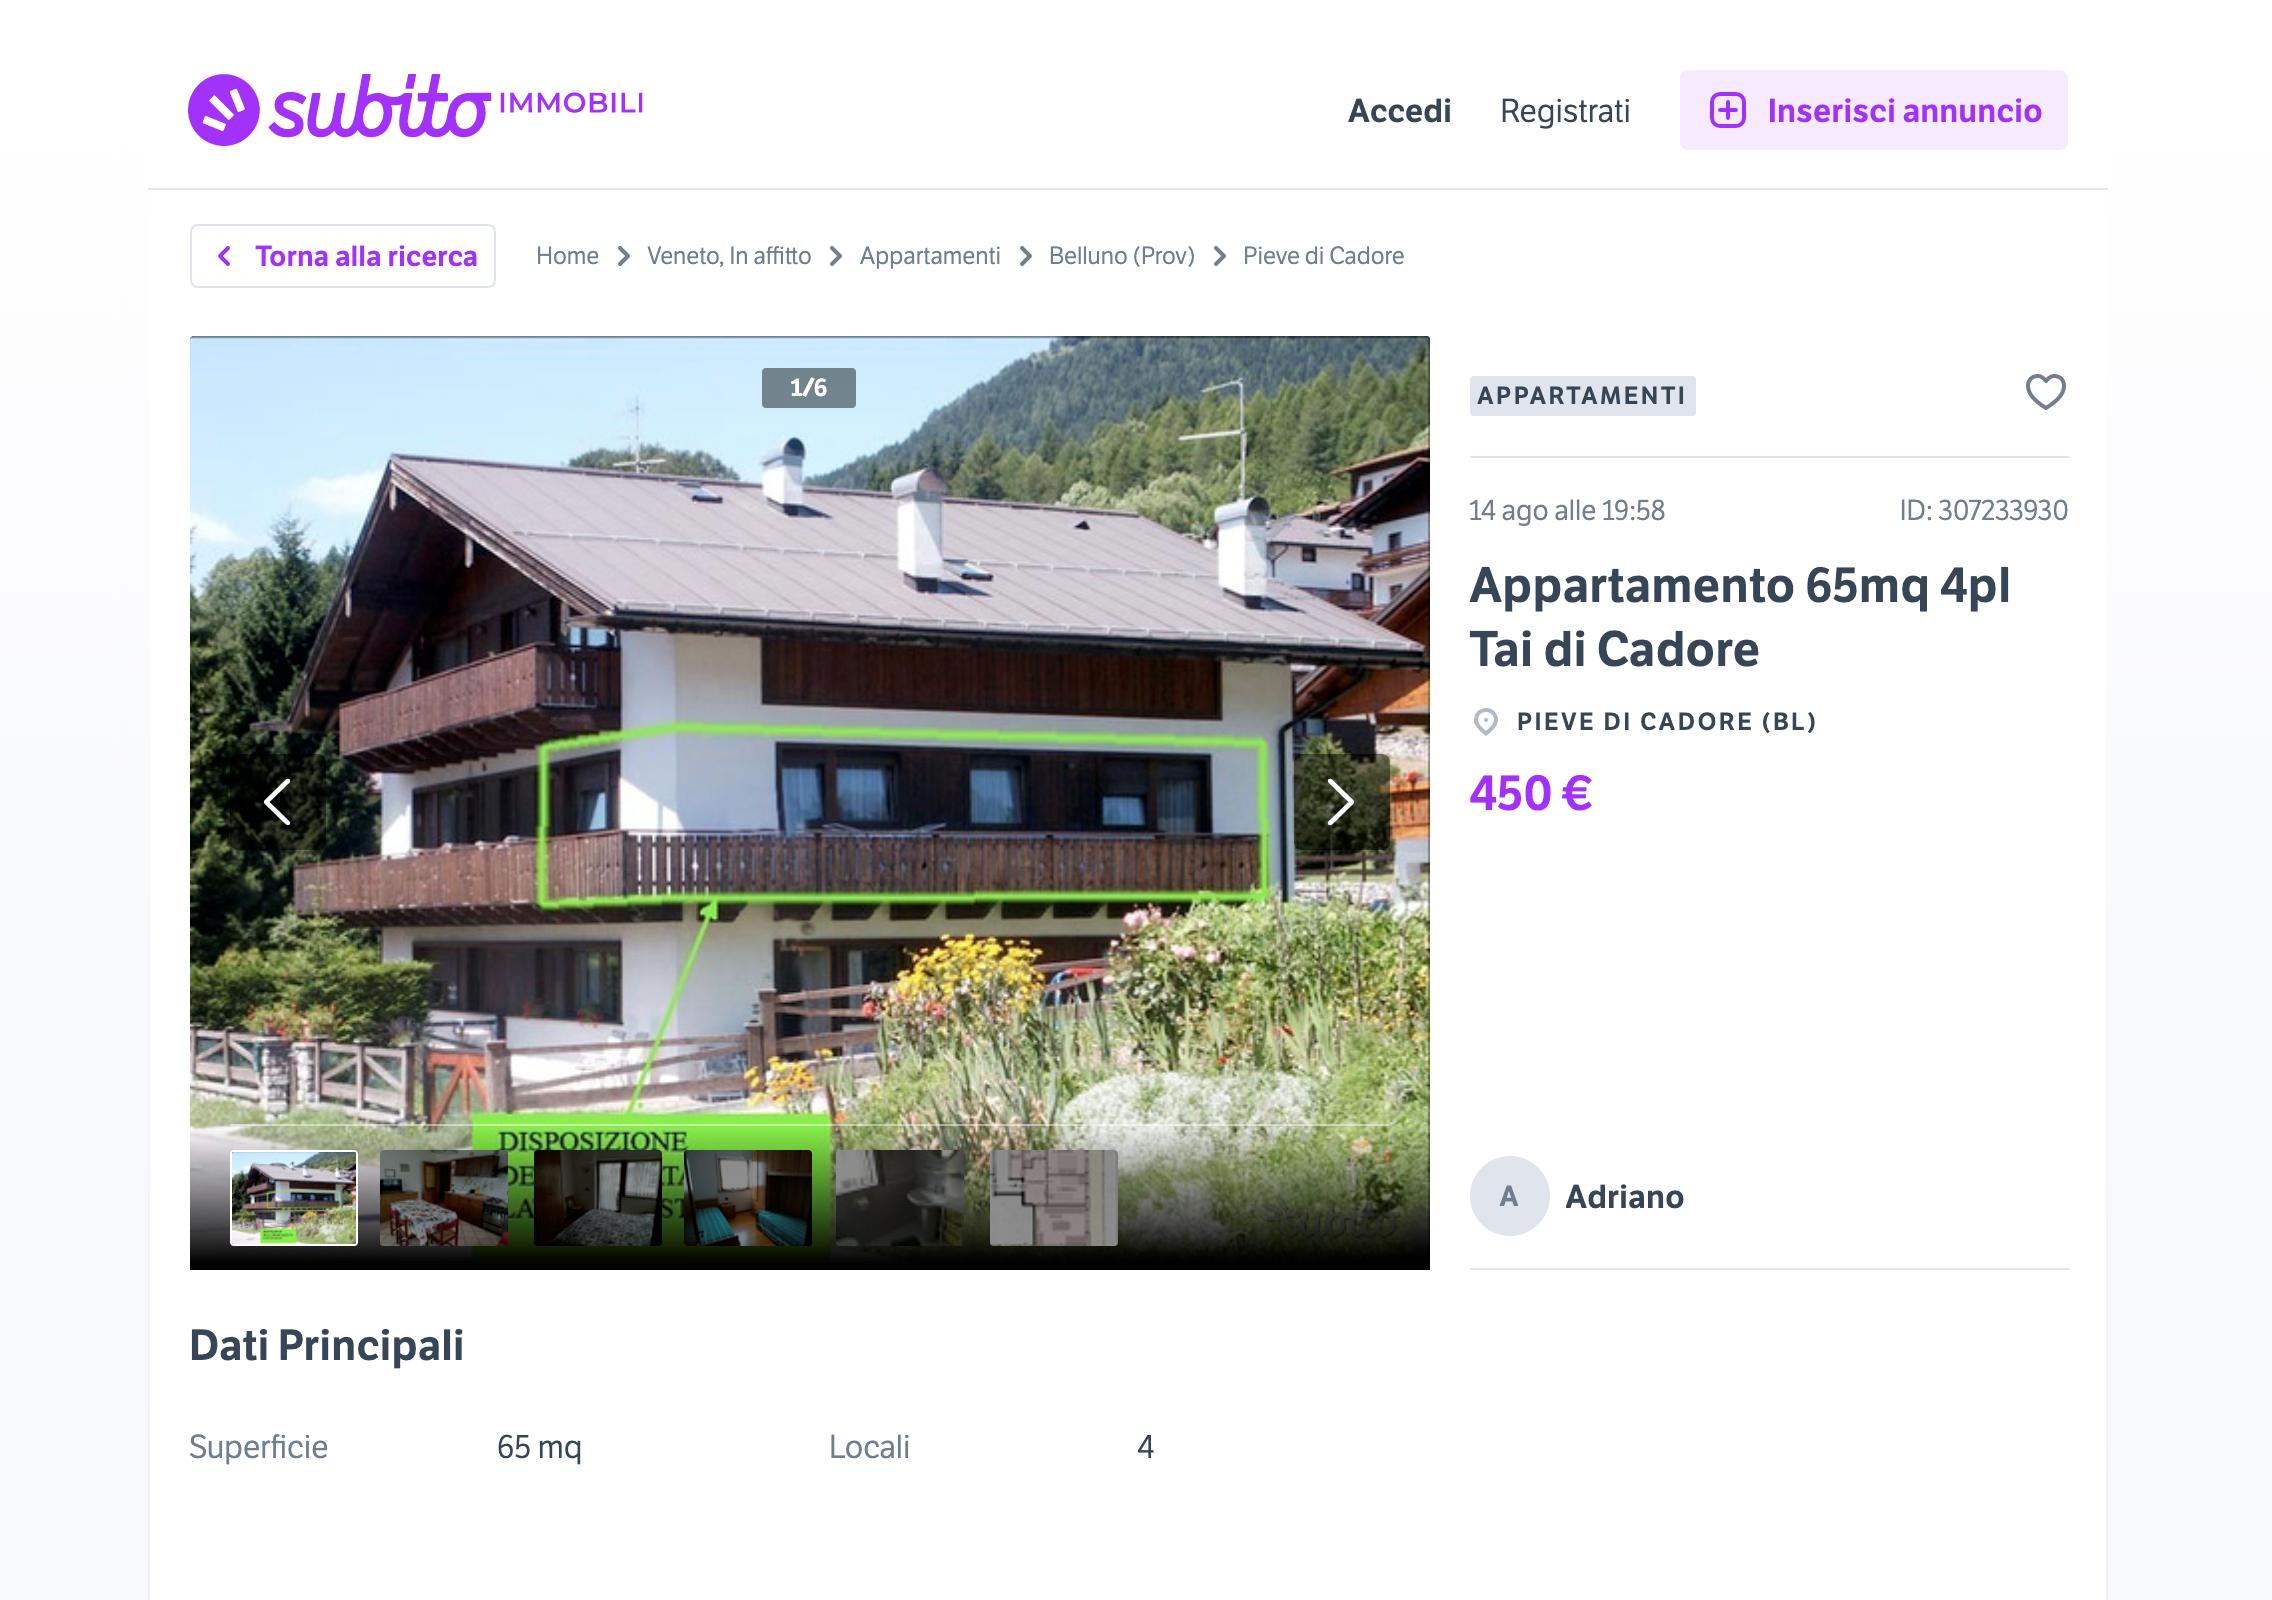 Вот в таком доме можно снять квартиру за 450€